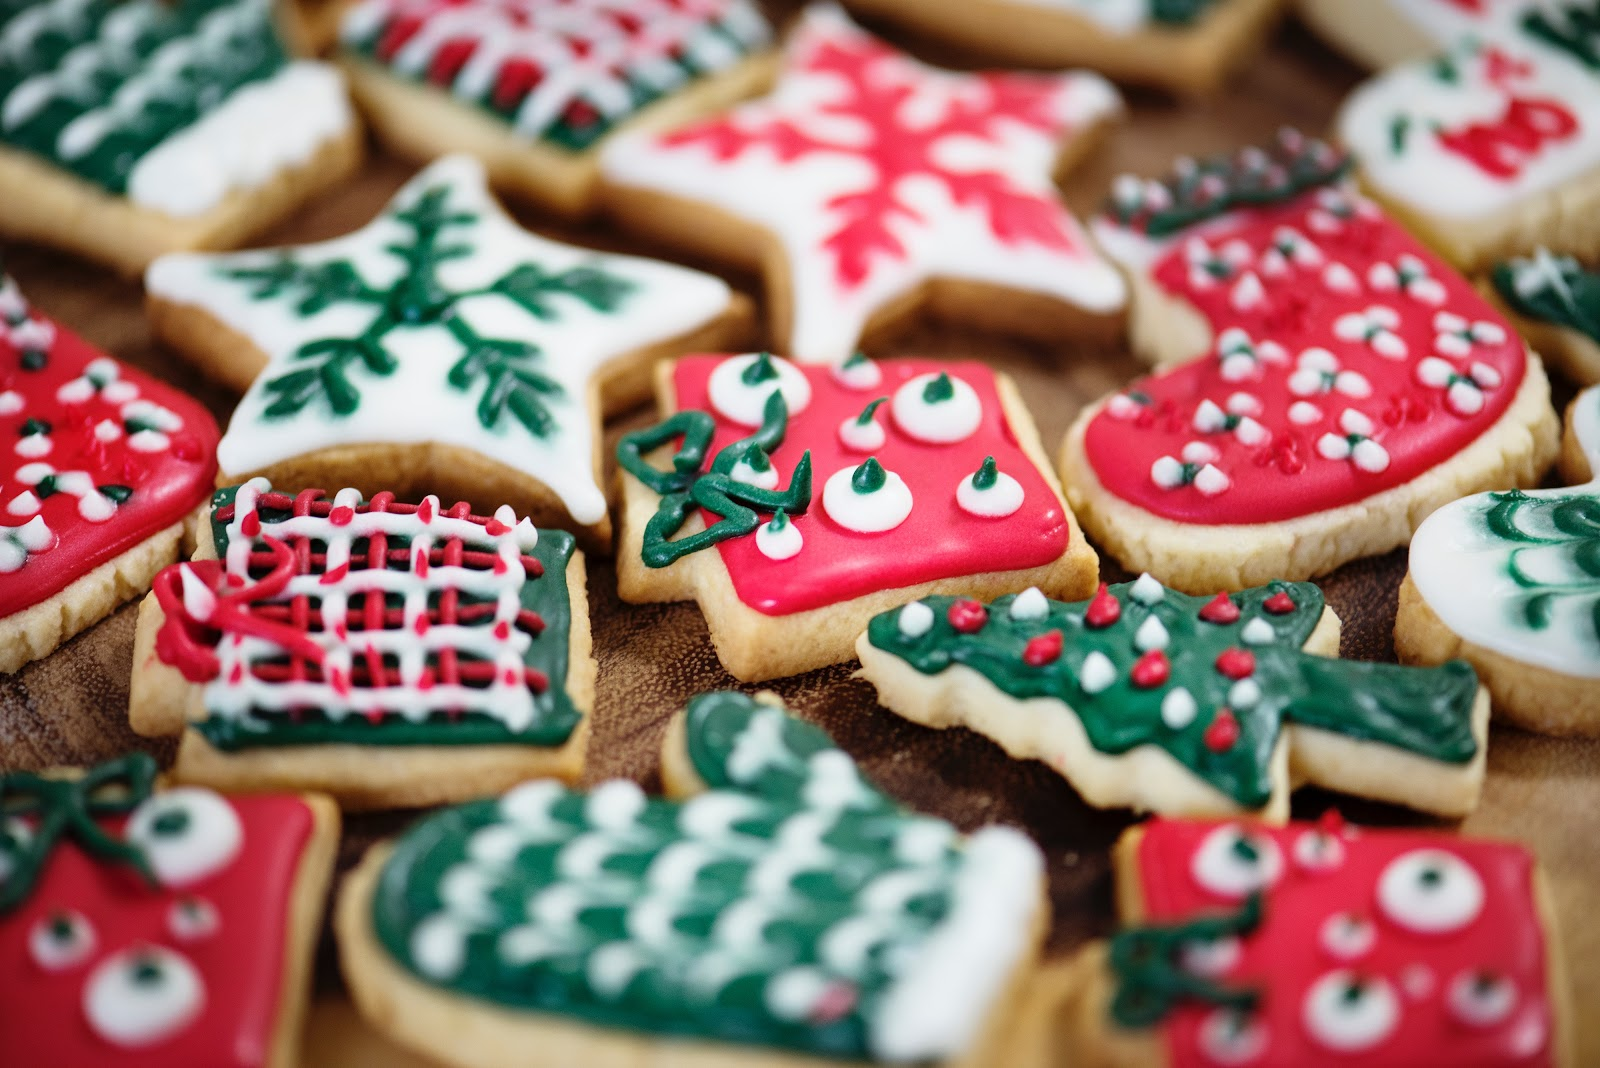 Tempting cookies